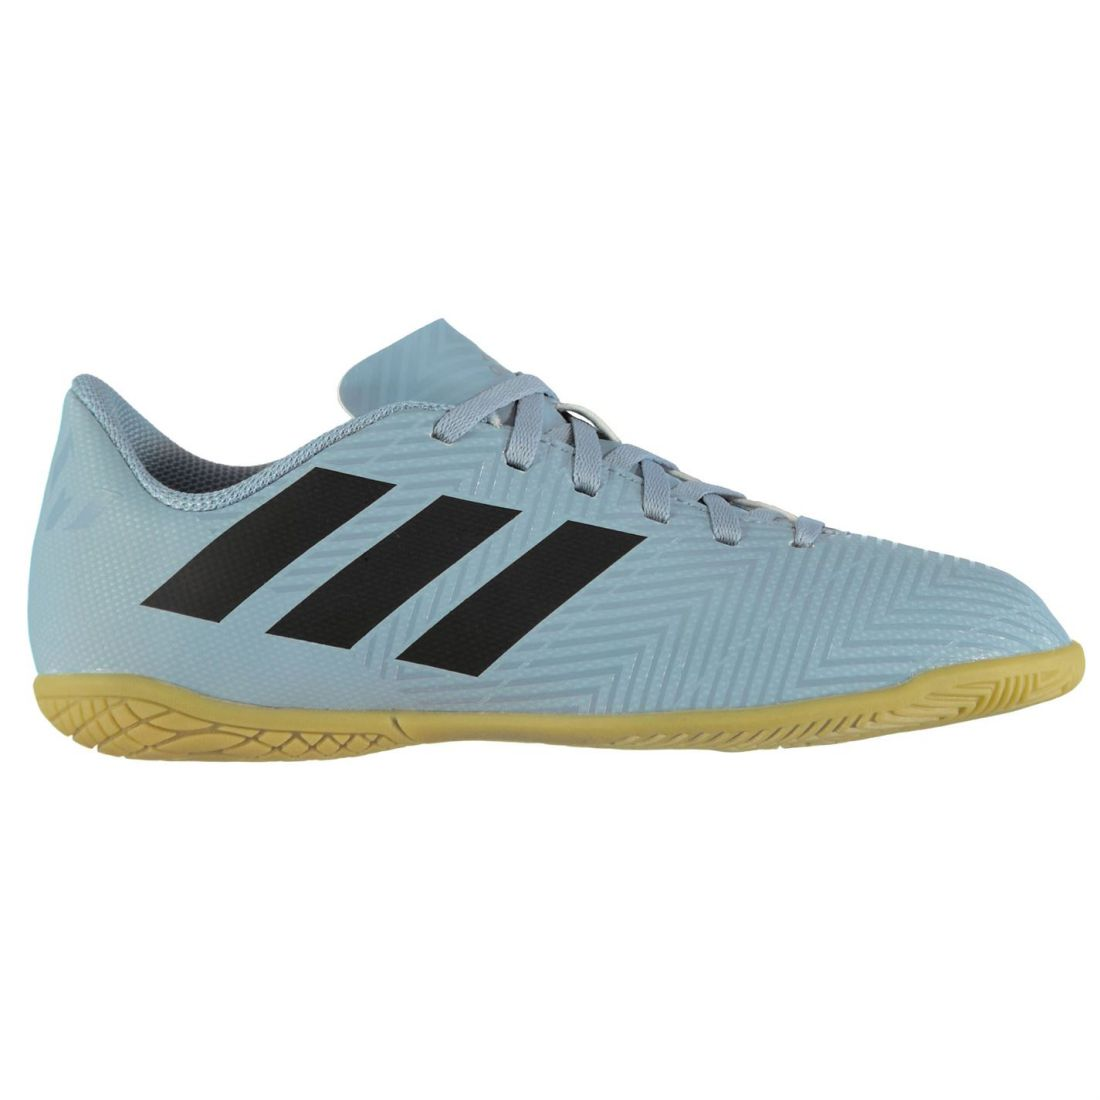 sale retailer cc1e3 08051 Image is loading adidas-Kids-Nemeziz-Messi-Tango-18-4-Junior-